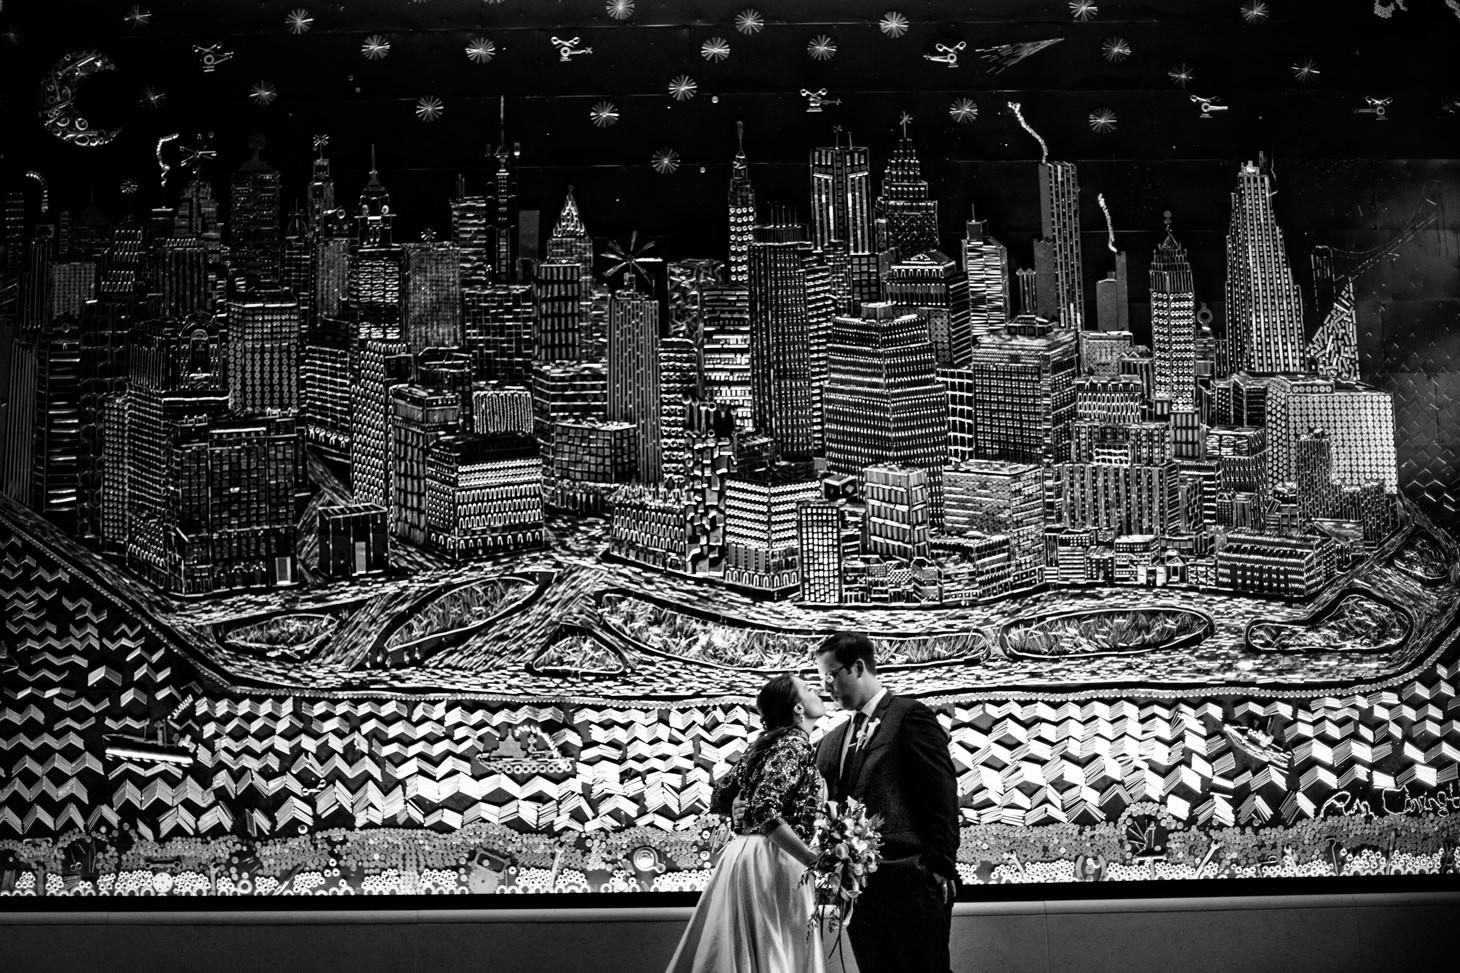 032-nyc-wedding-photographer-smitten-chickens-elope-nyc-wedding-photographer-museum-wedding-smitten-chickens-hoboken.jpg